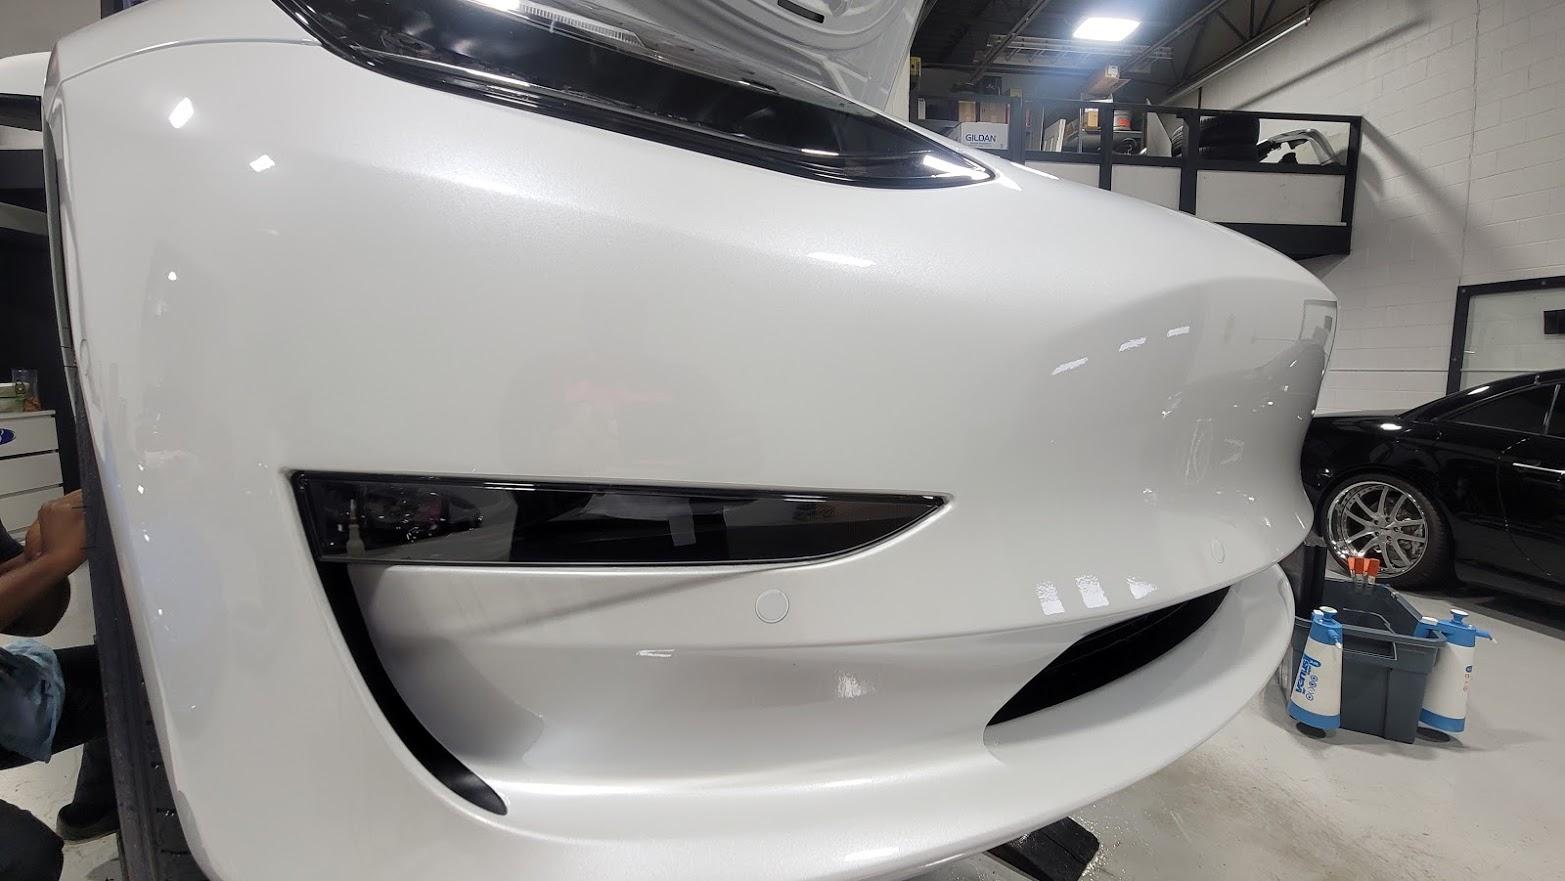 Best Tesla Protection - Ceramic Pro Ceramic Coating, XPEL PPF